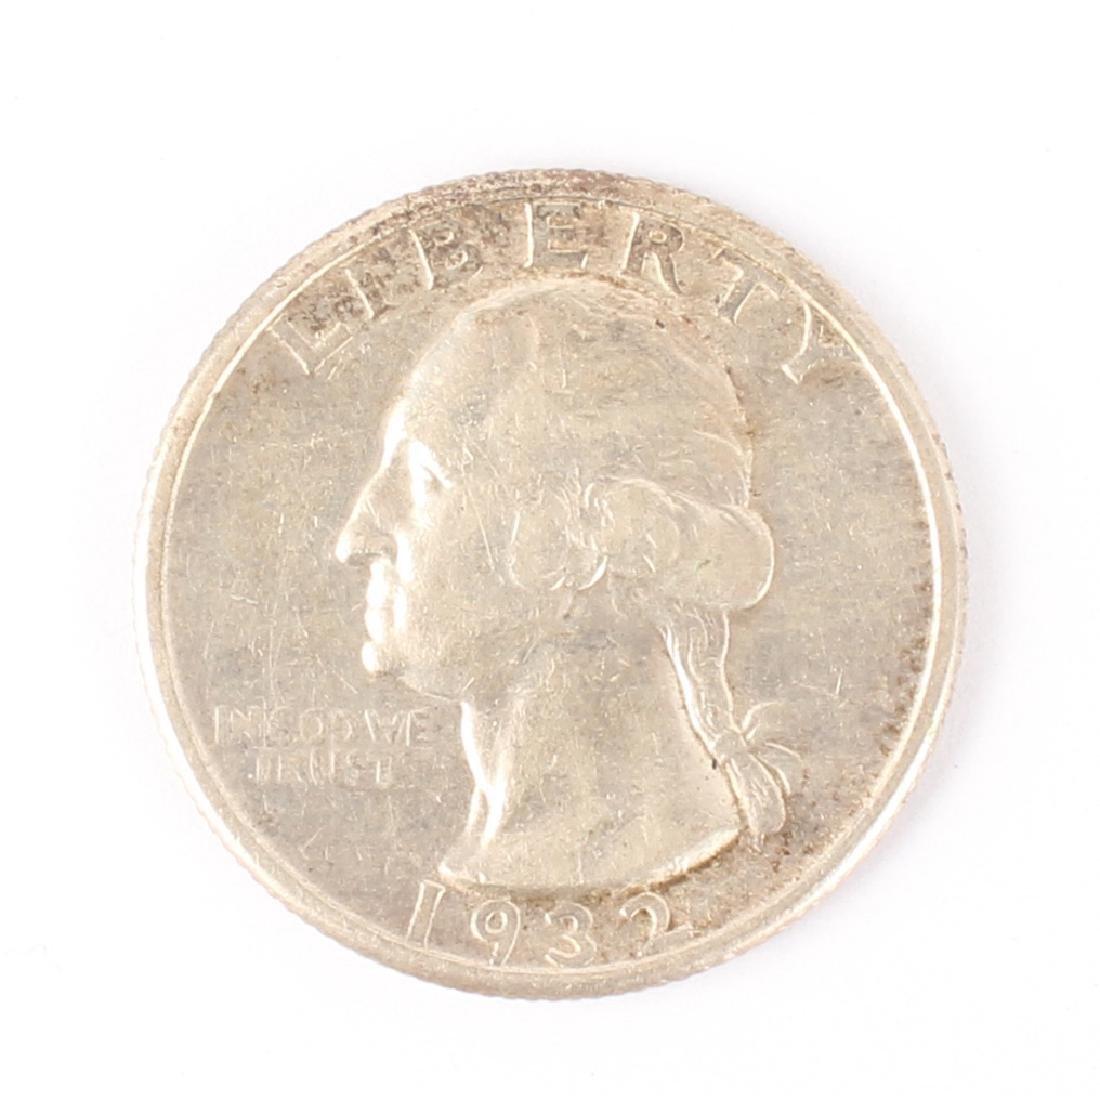 1932 D WASHINGTON SILVER QUARTER DOLLAR KEY DATE